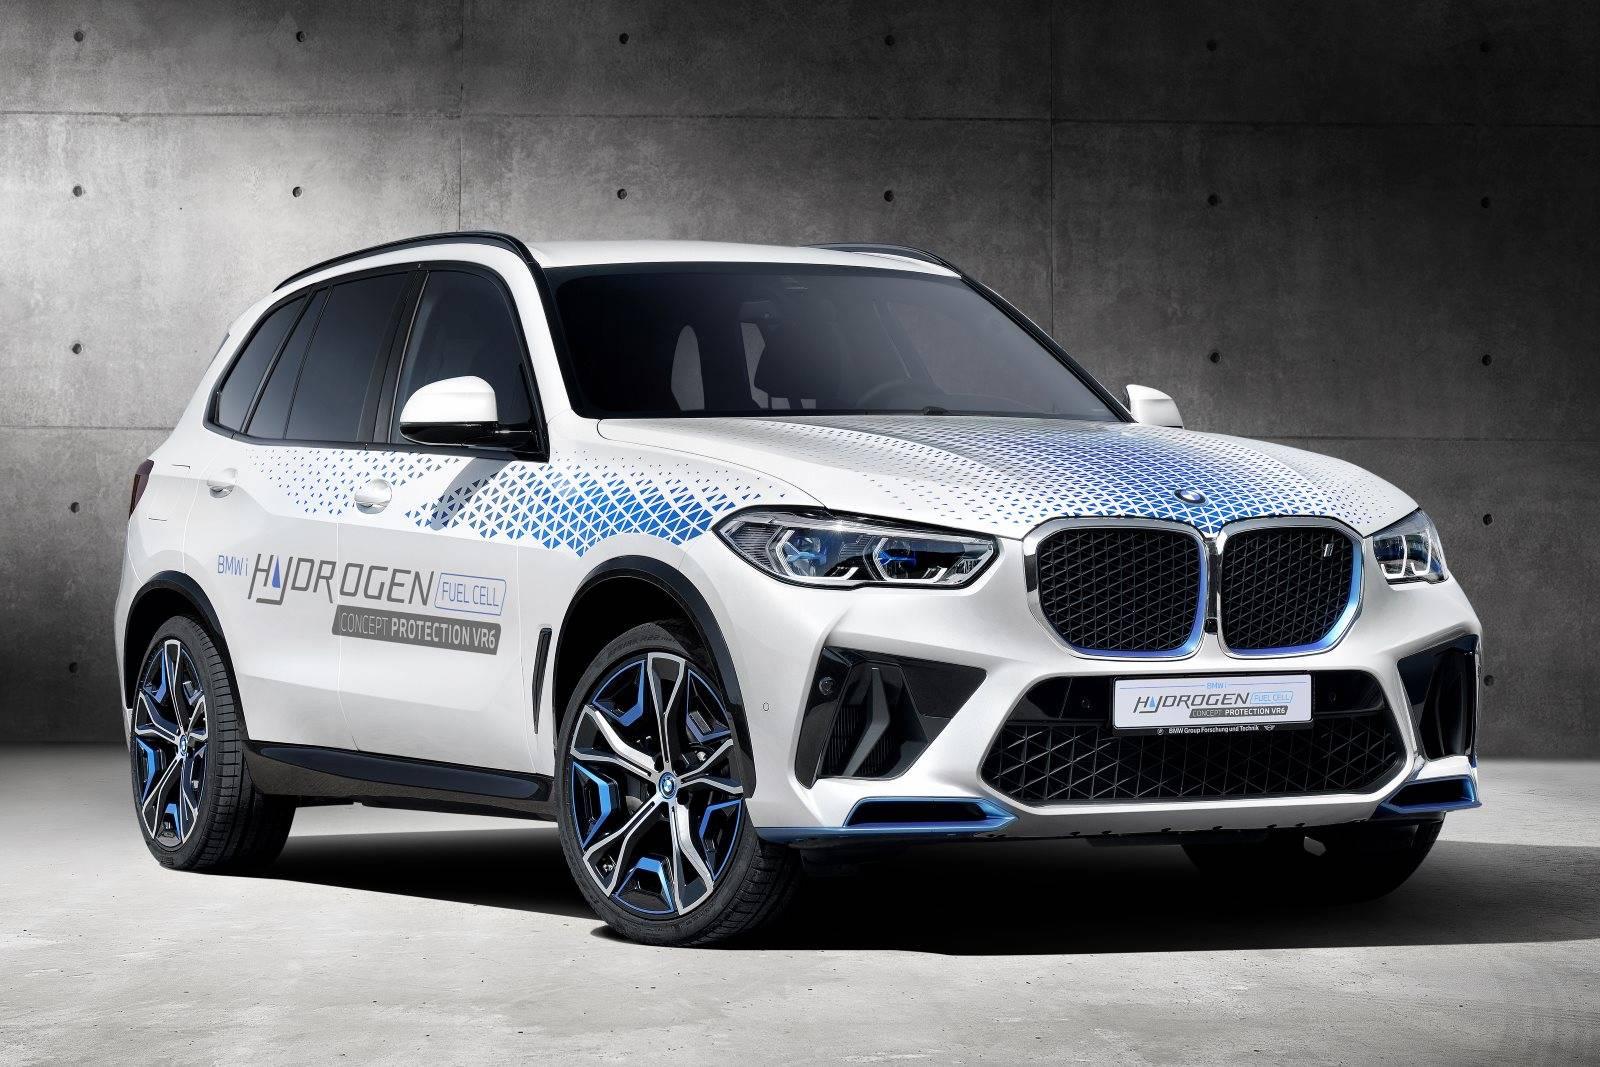 IAA Mobility 2021 - в центре внимания BMW Group Innovation Workshop 3